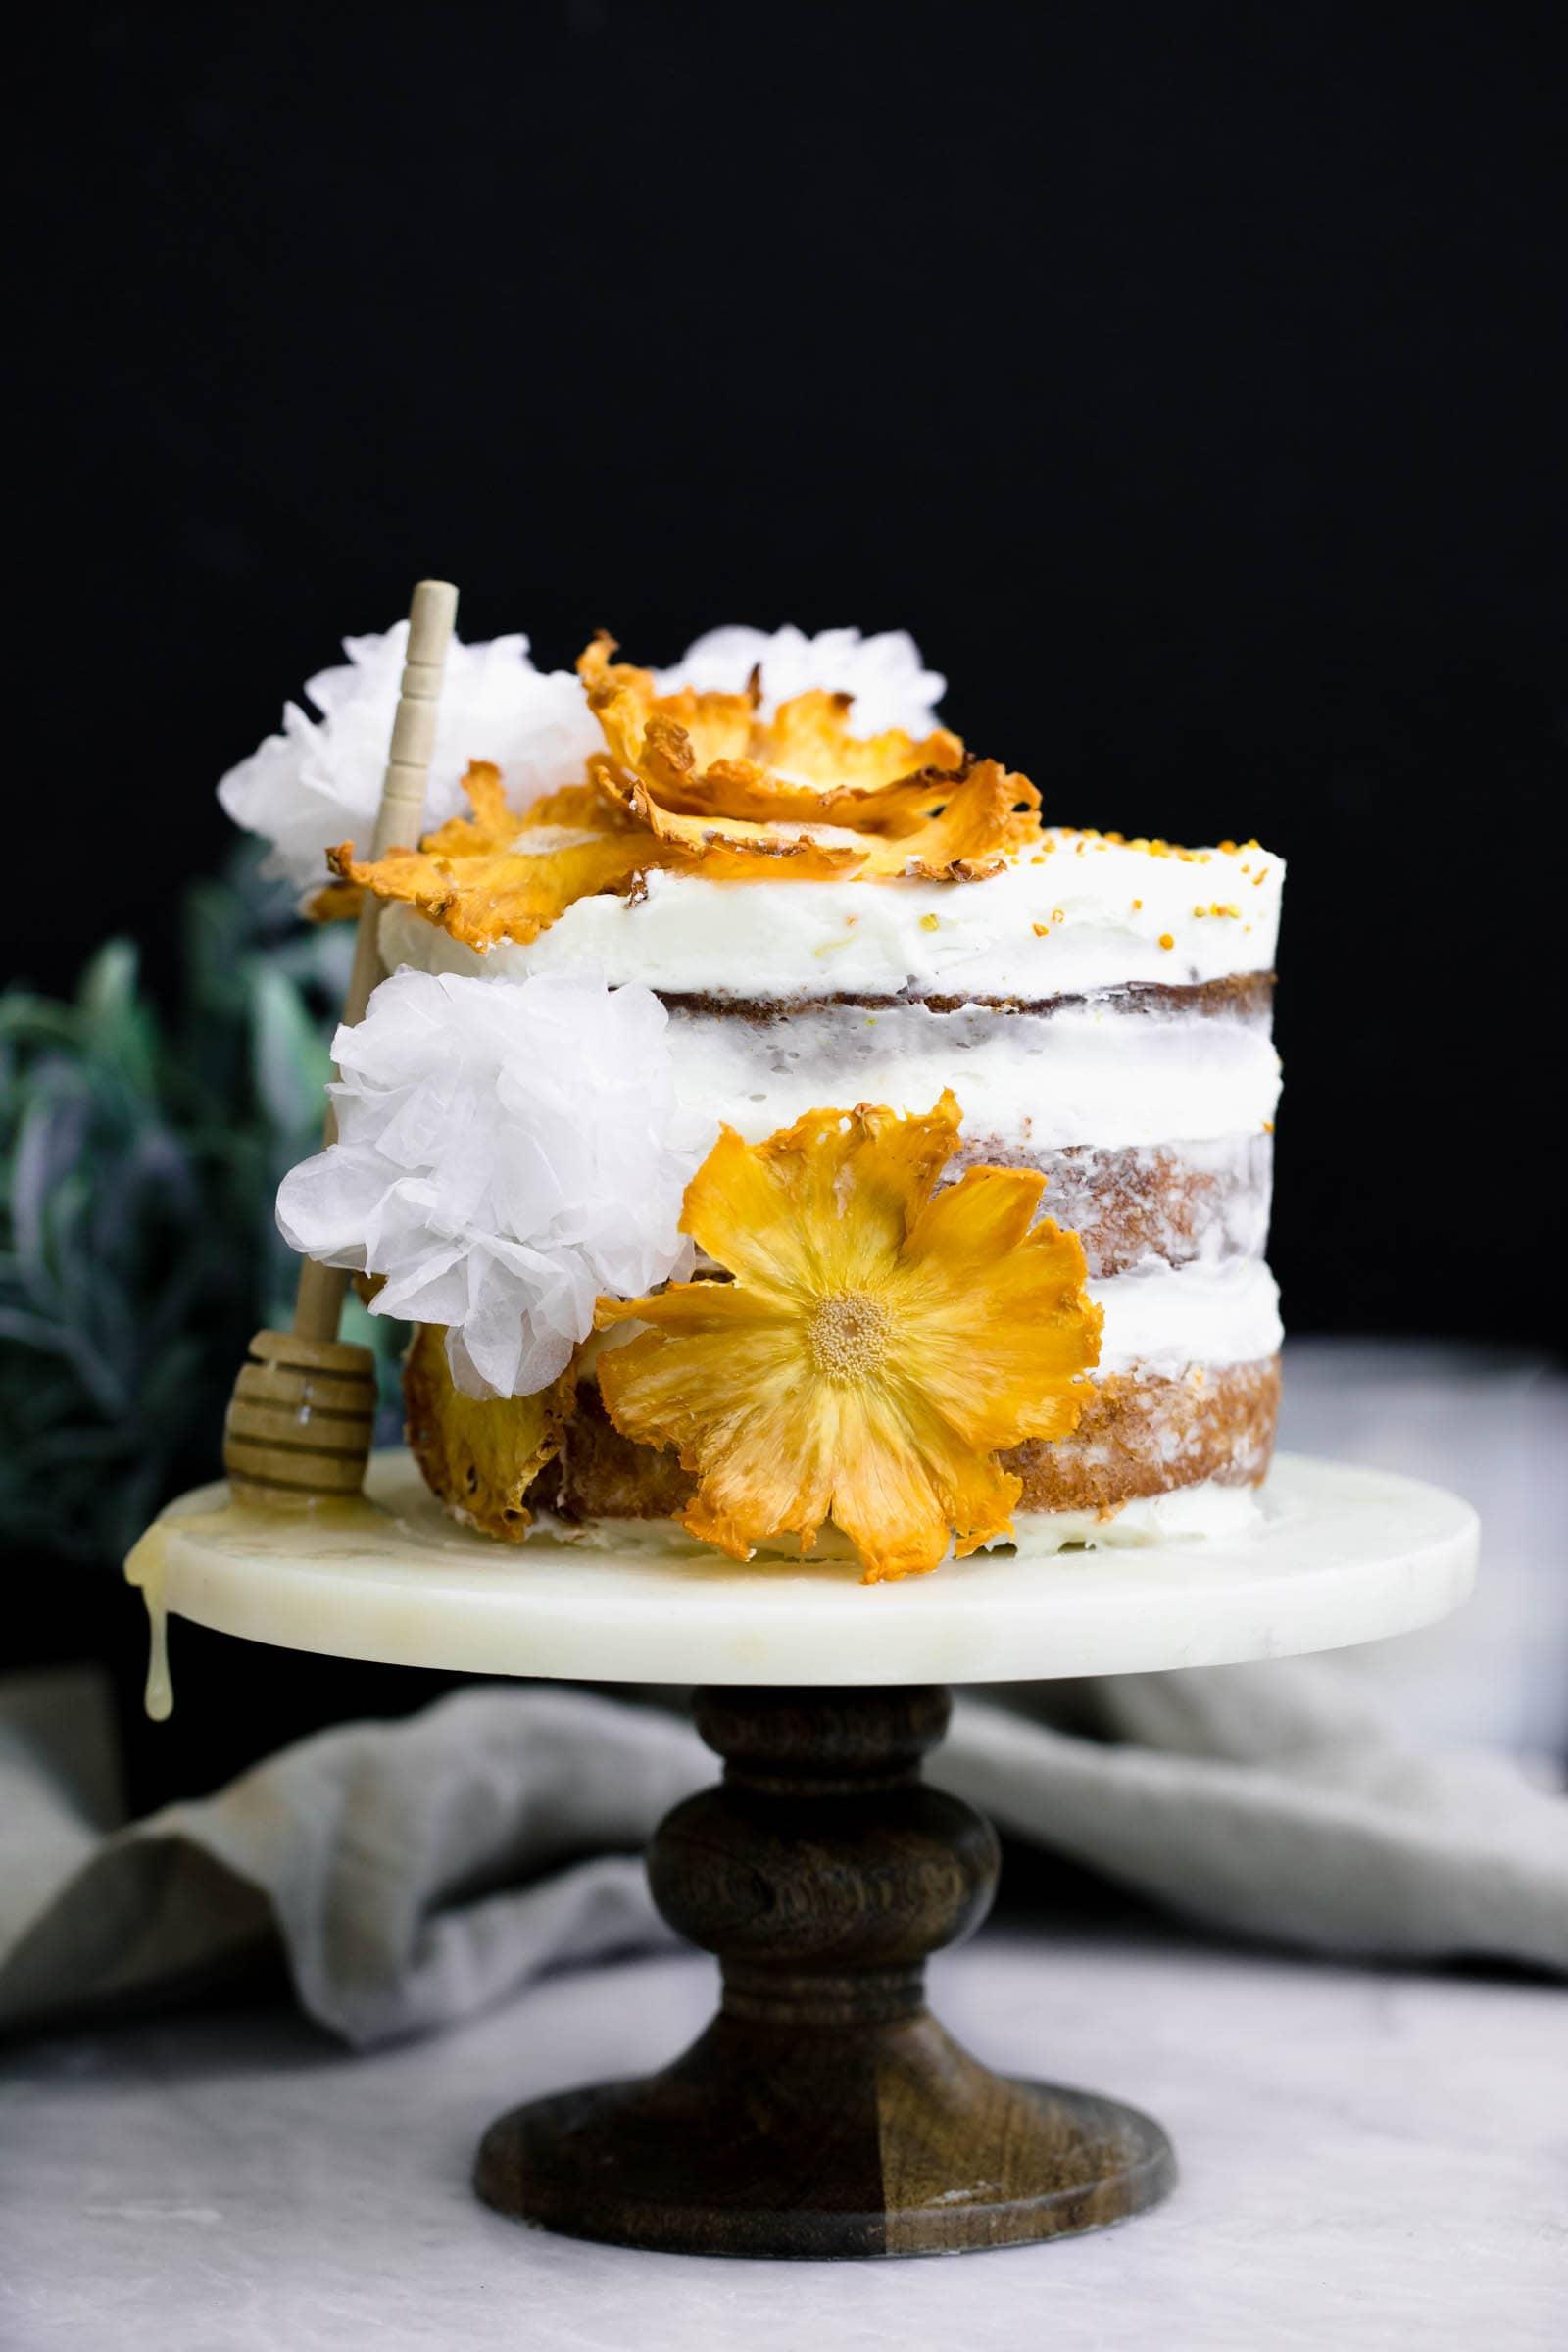 Hummingbird Cake on cake stand with honey